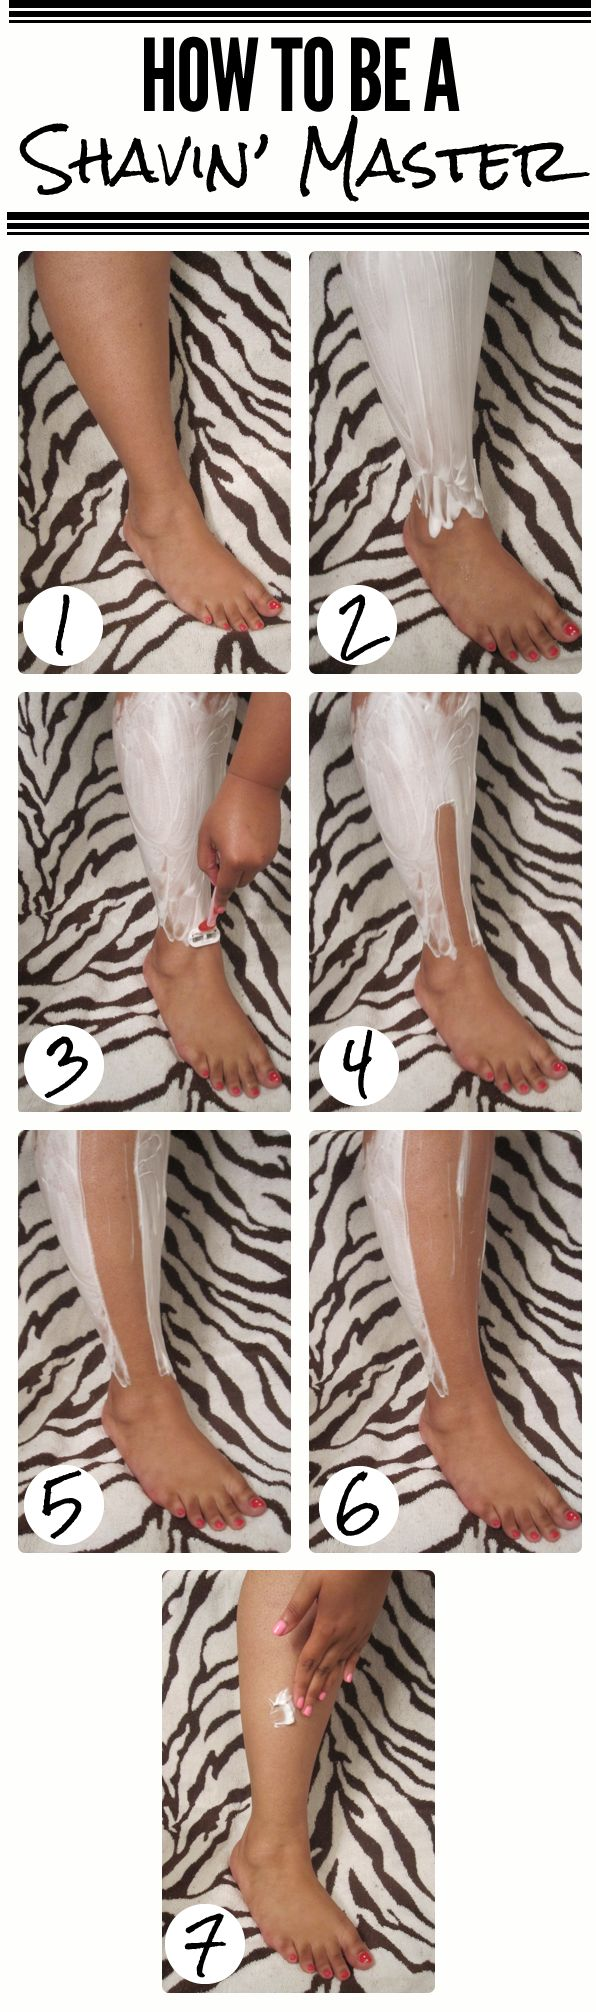 Best 25+ Smooth Legs Shaving Ideas On Pinterest  Sugar Scrub Shaving, Best  Shave And Leg Shaving